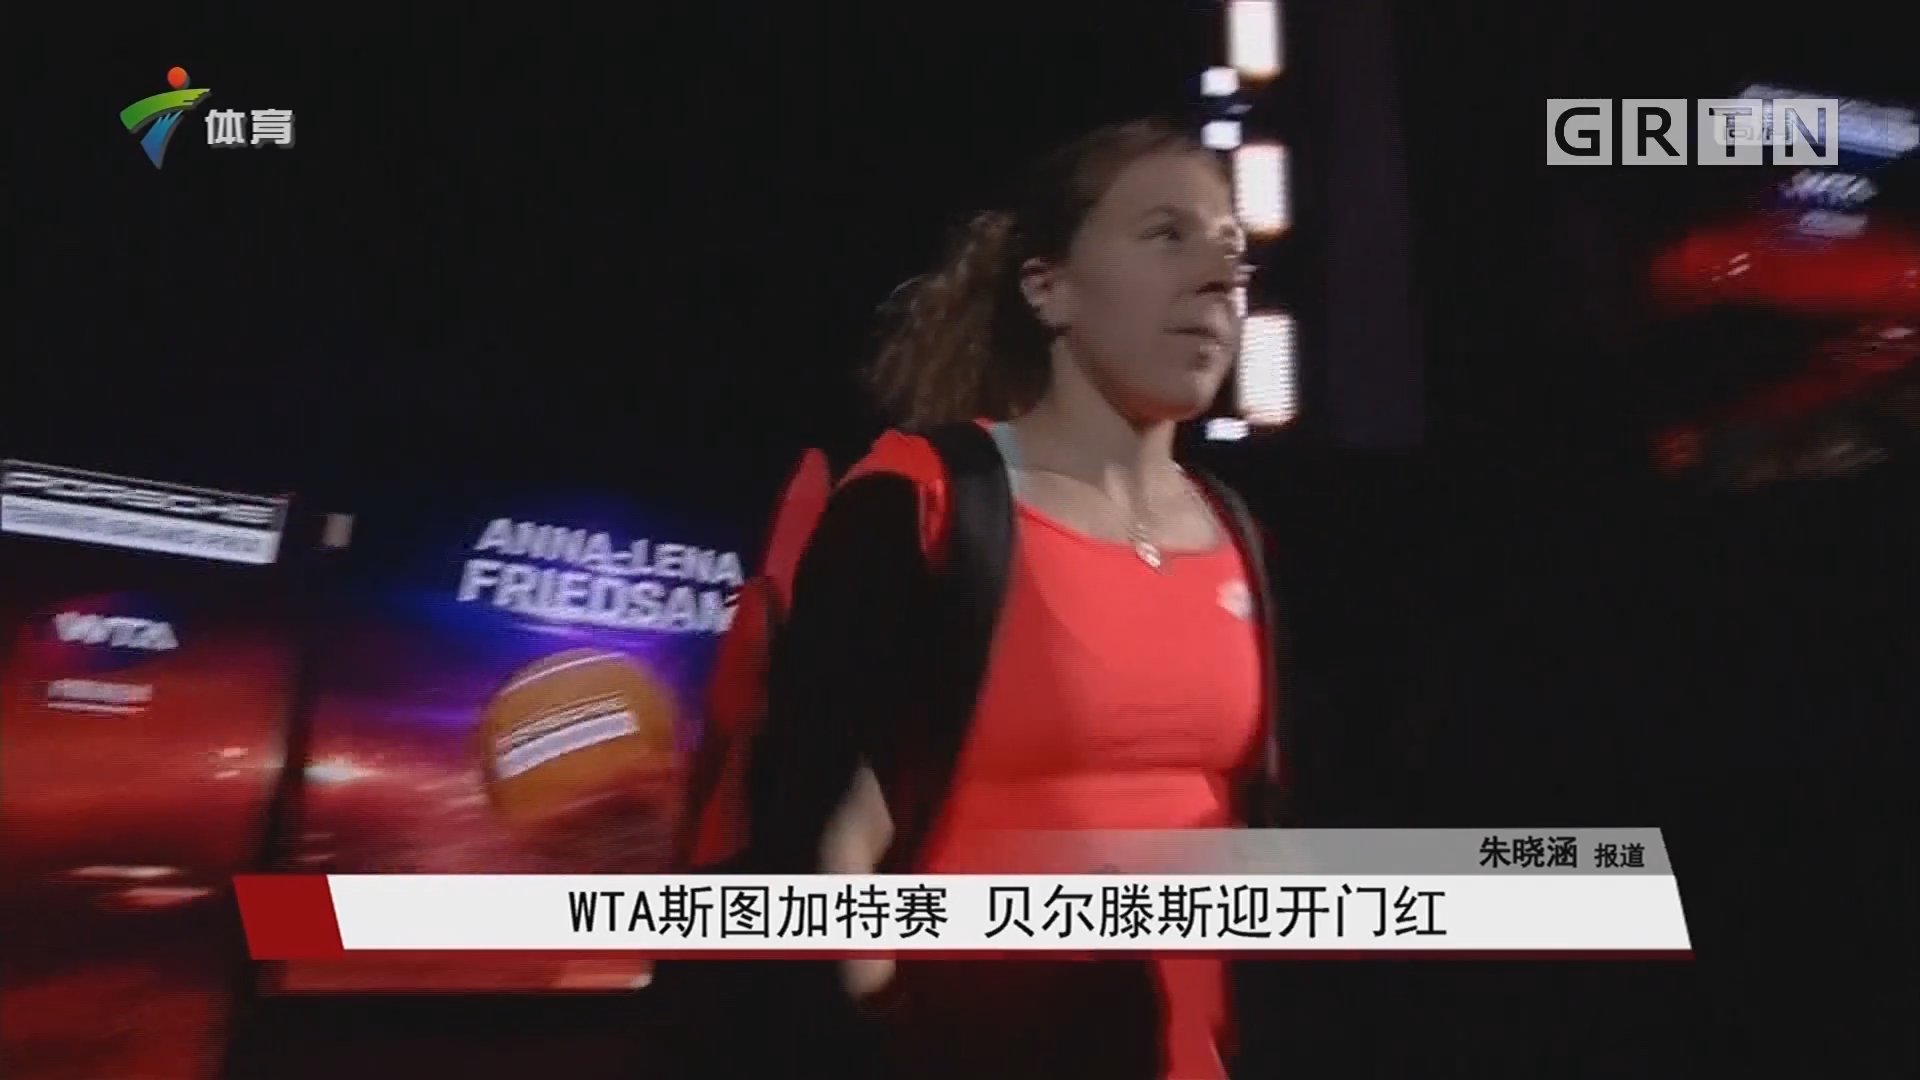 WTA斯图加特赛 贝尔滕斯迎开门红